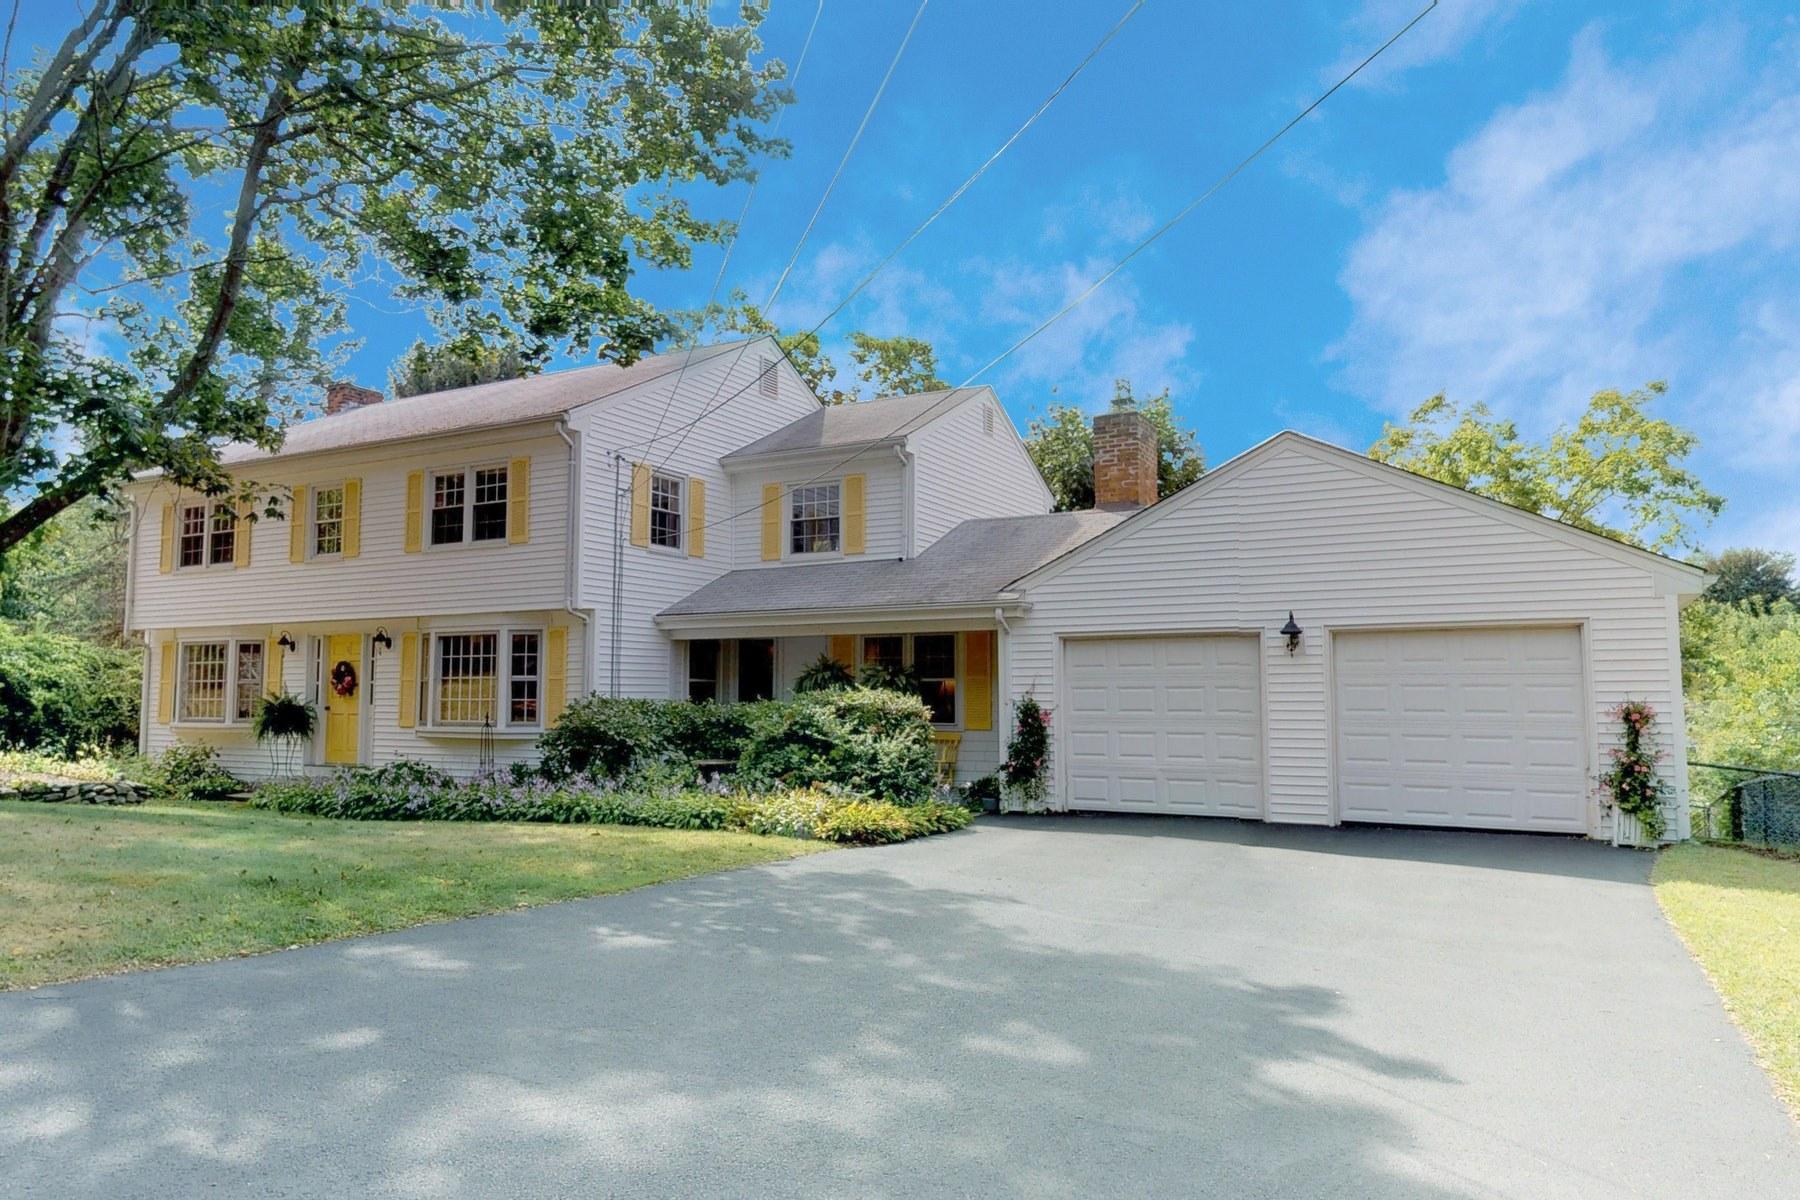 Single Family Homes for Sale at 3 Water Way, Barrington, RI Barrington, Rhode Island 02806 United States